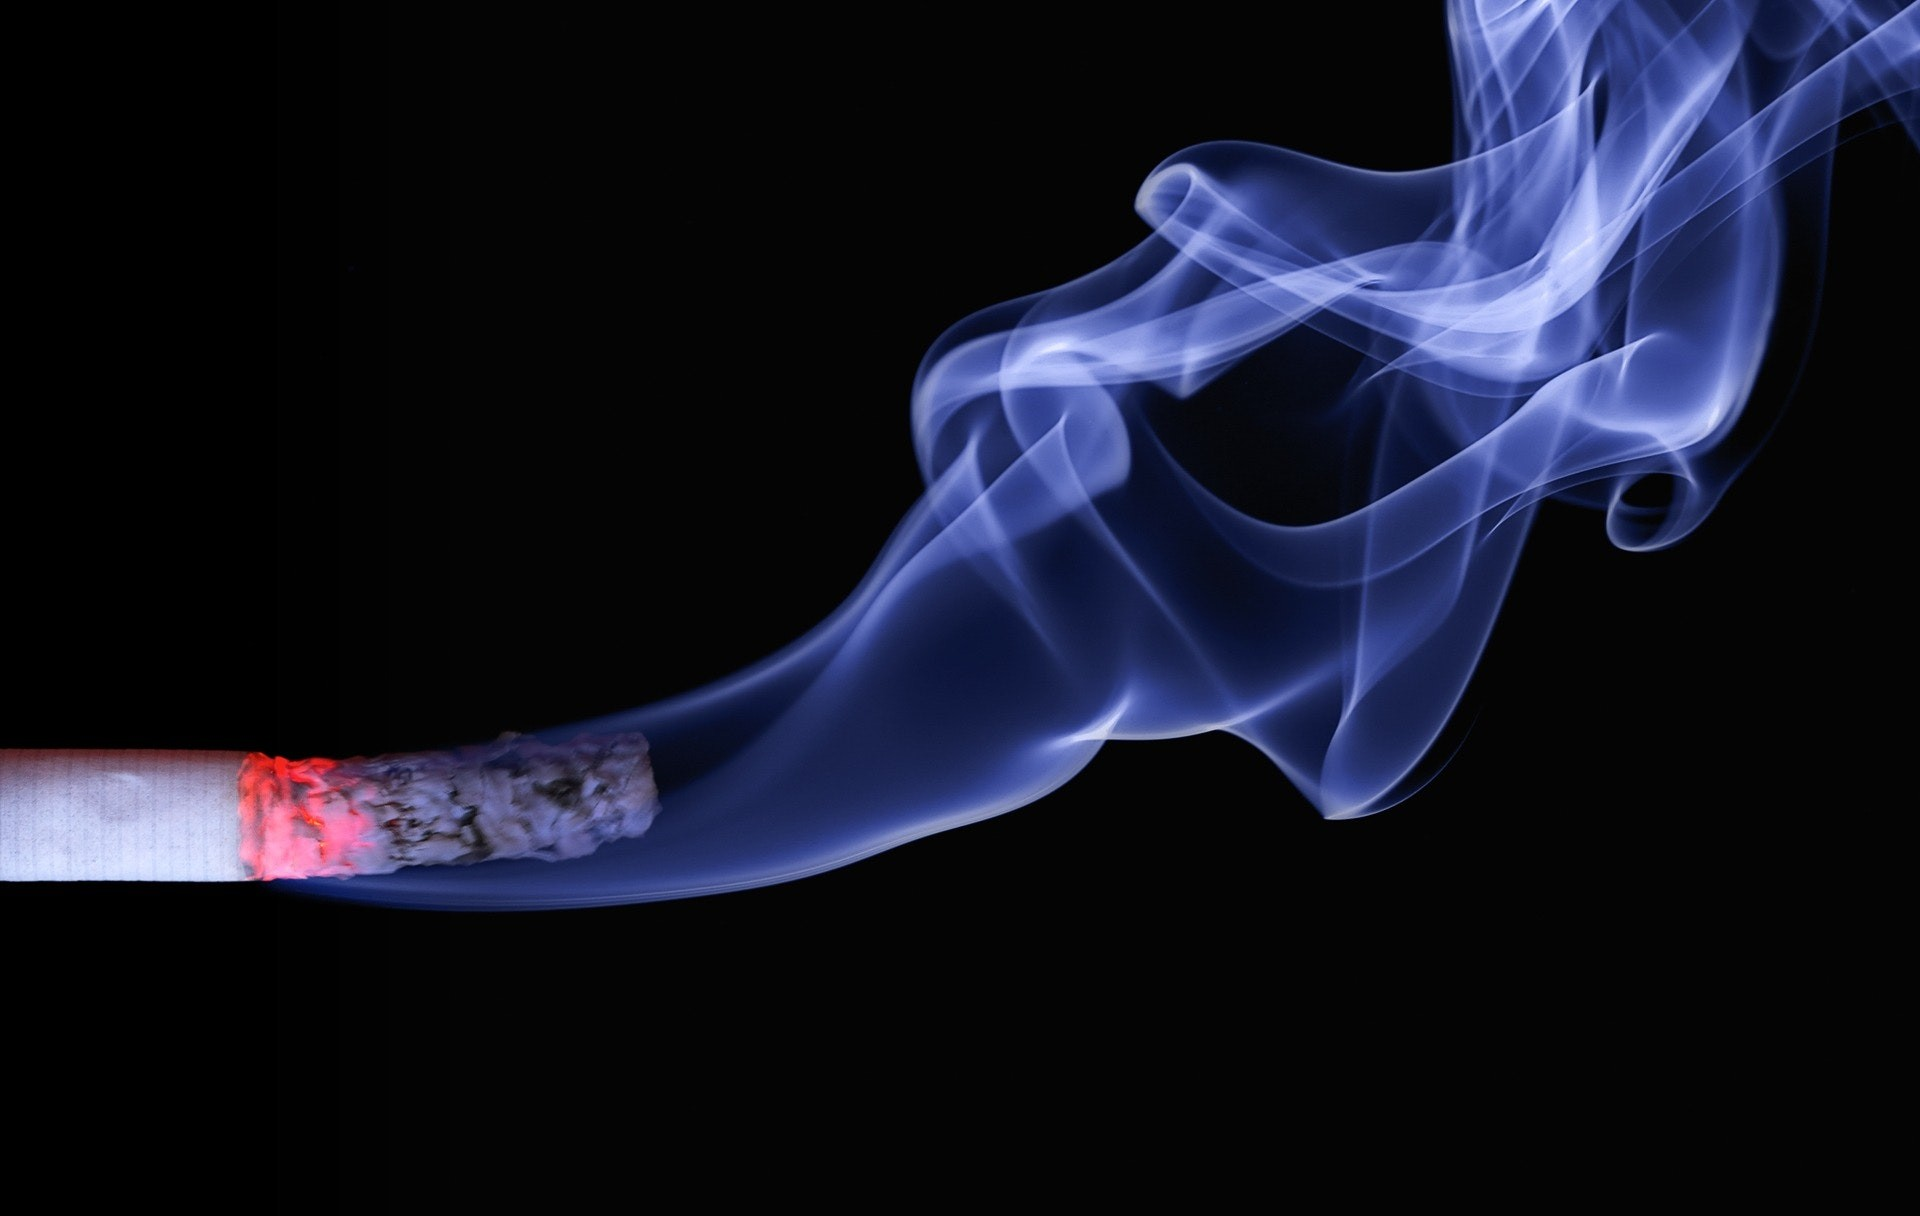 Fumantes têm 14 vezes mais chances de desenvolver casos graves de Covid-19 (Foto: Pexels)